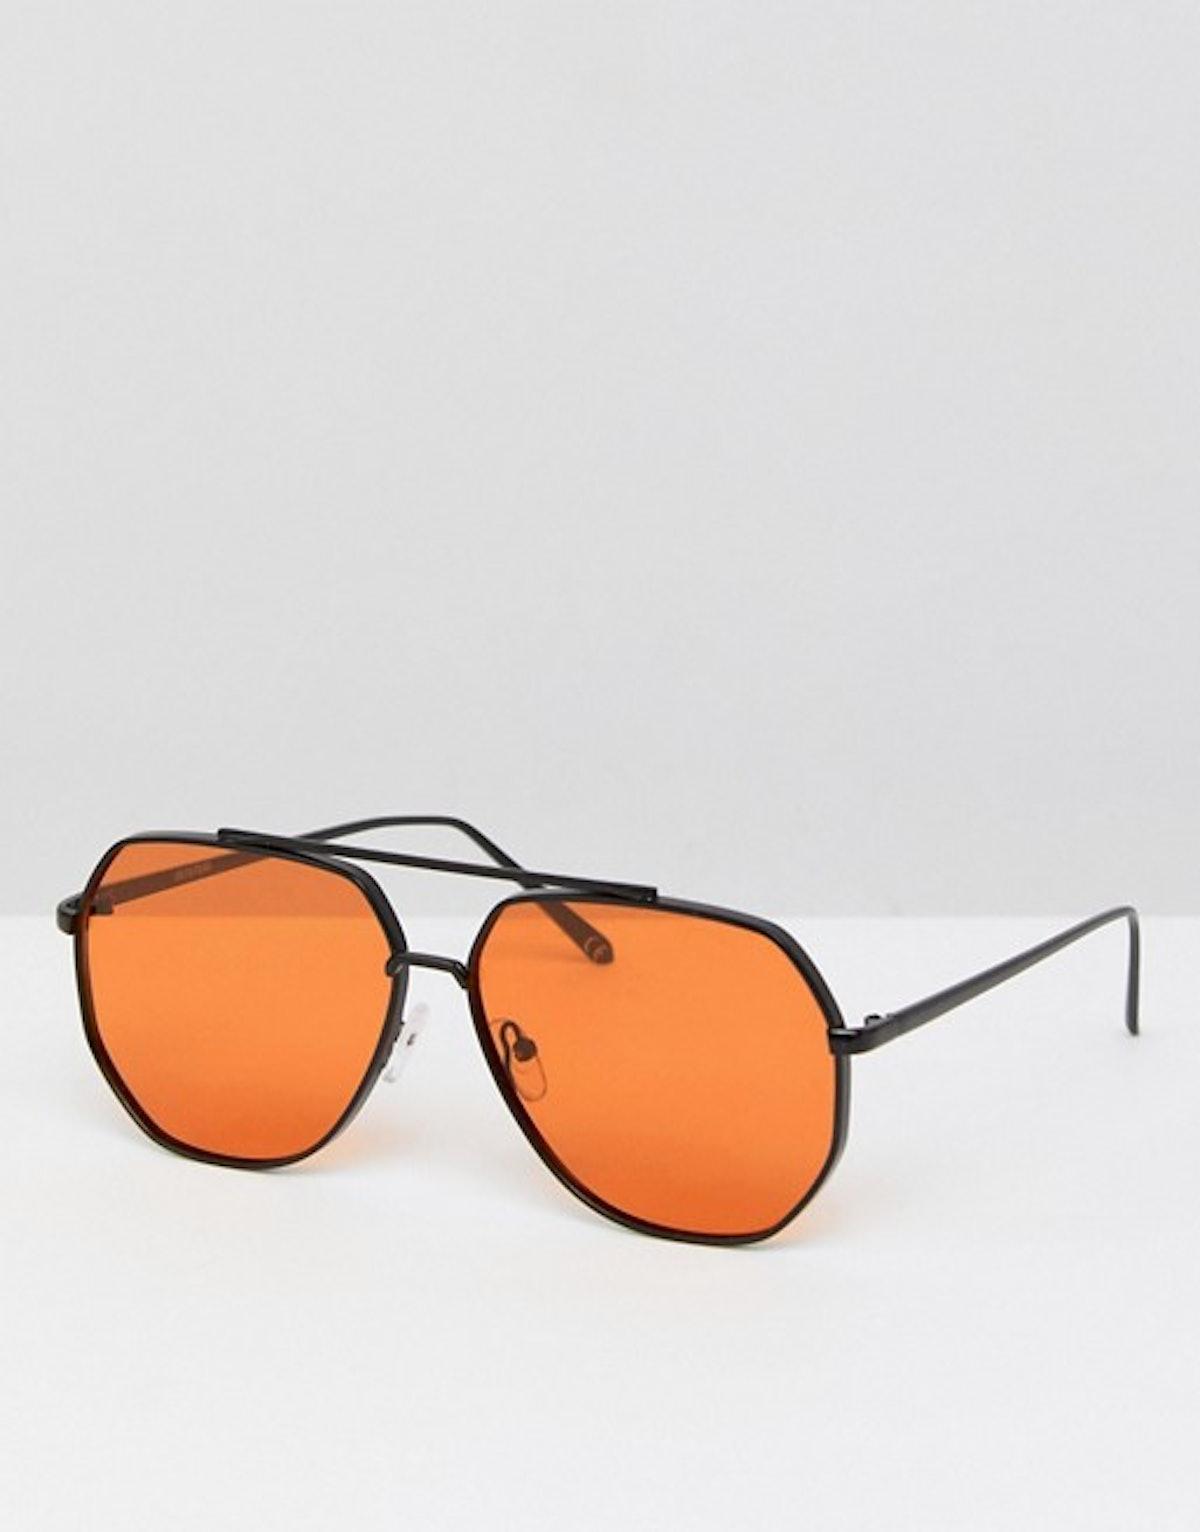 ASOS Black Metal Aviator Fashion Sunglasses With Orange Lens